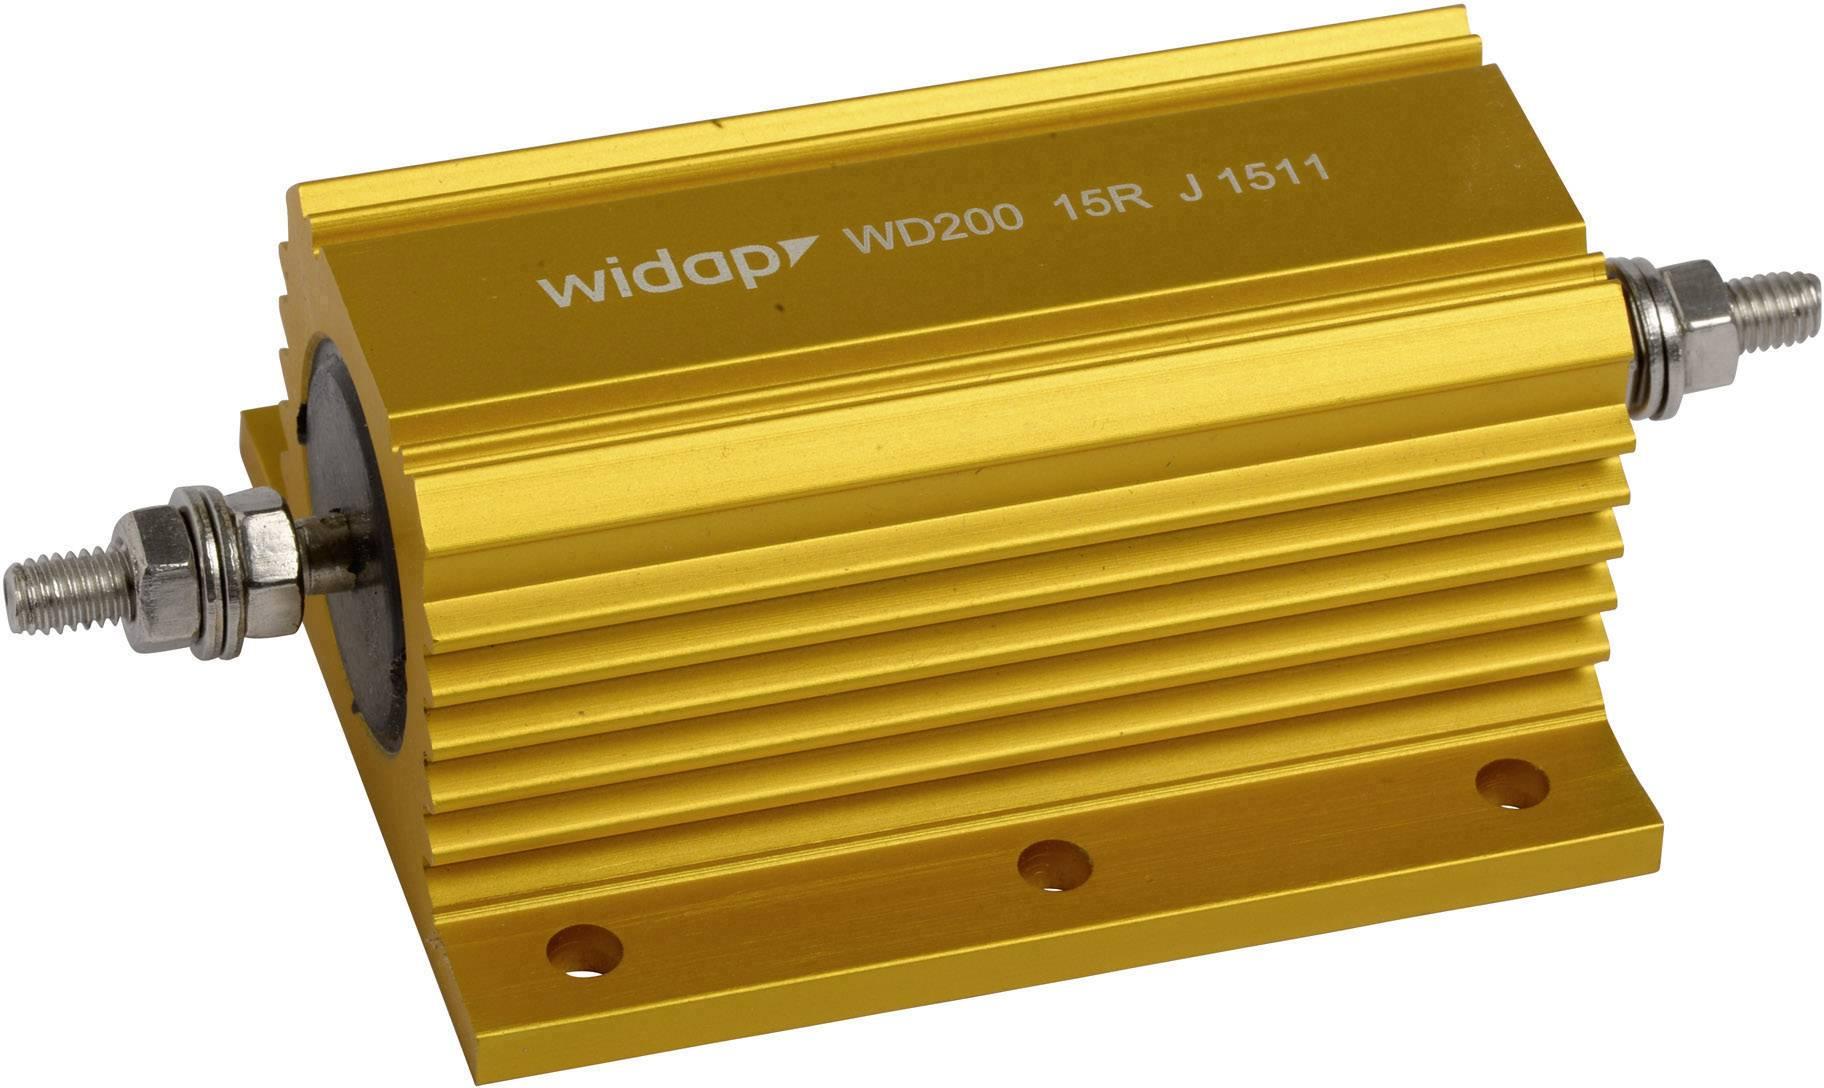 Drôtový rezistor Widap 160170, hodnota odporu 3.3 Ohm, 300 W, 1 ks